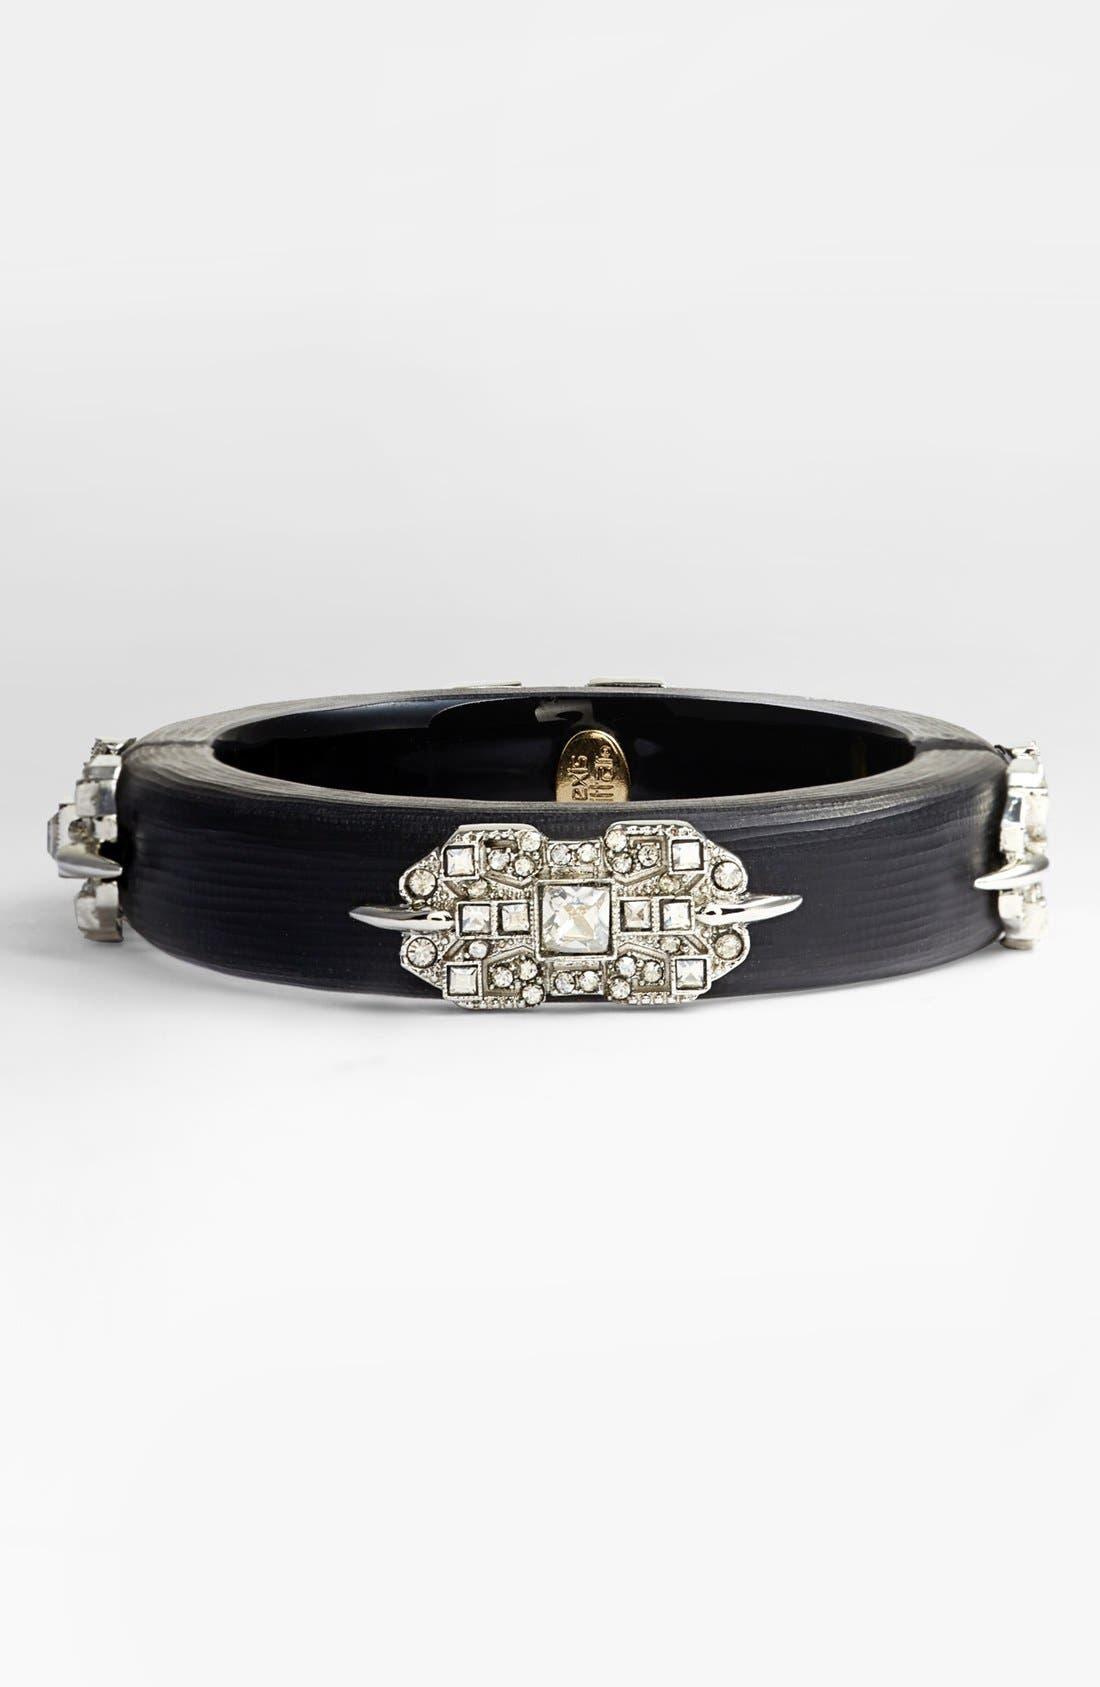 Main Image - Alexis Bittar 'Lucite® - Santa Fe Deco' Bracelet